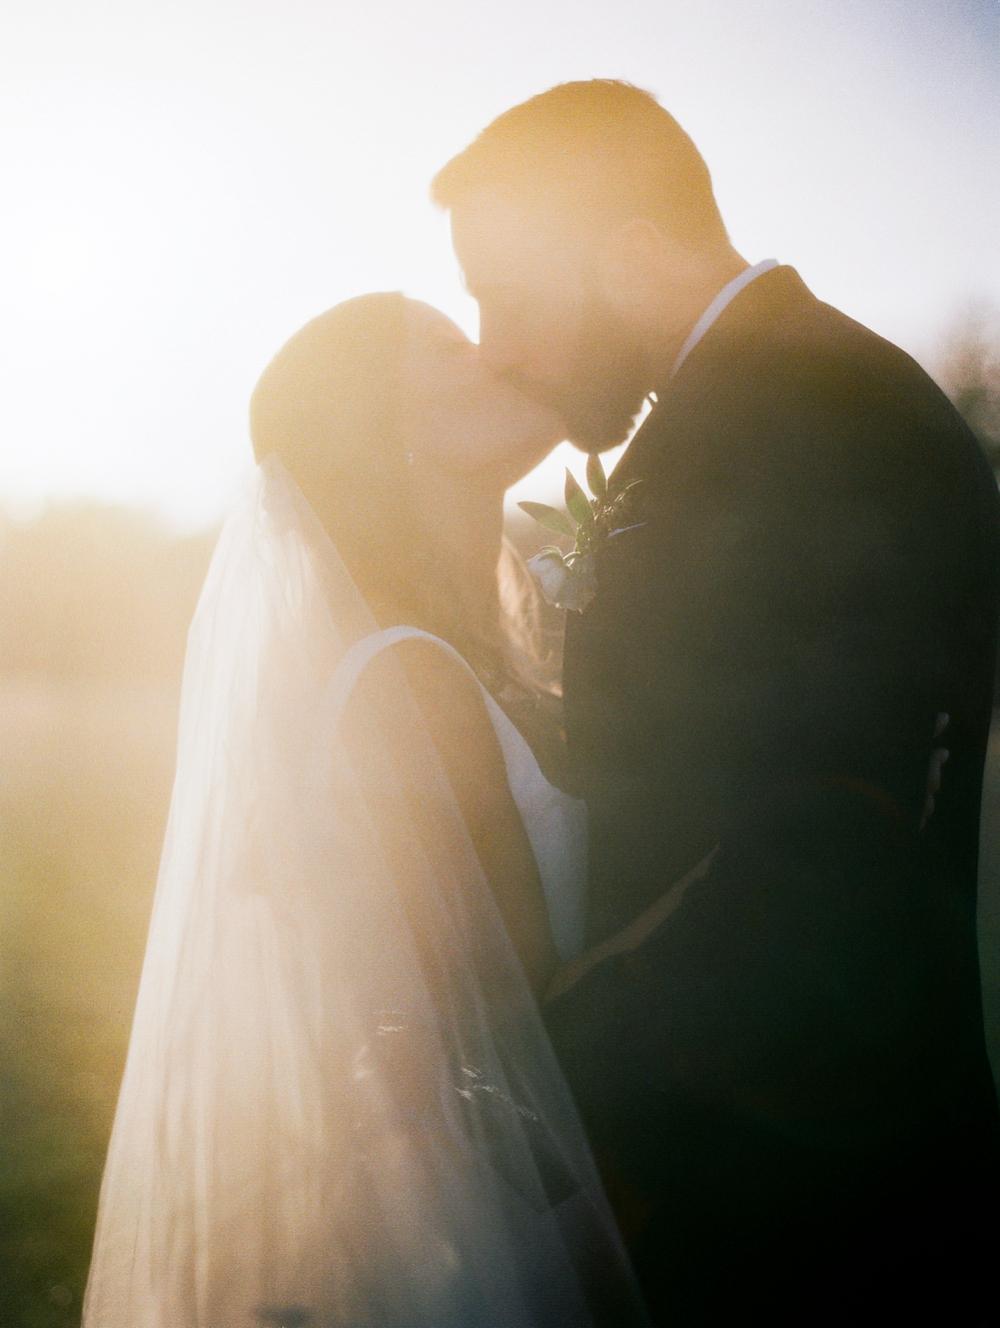 Kristin-La-Voie-Photography-austin-houston-texas-wedding-photographer-the-oaks-at-high-hill -27